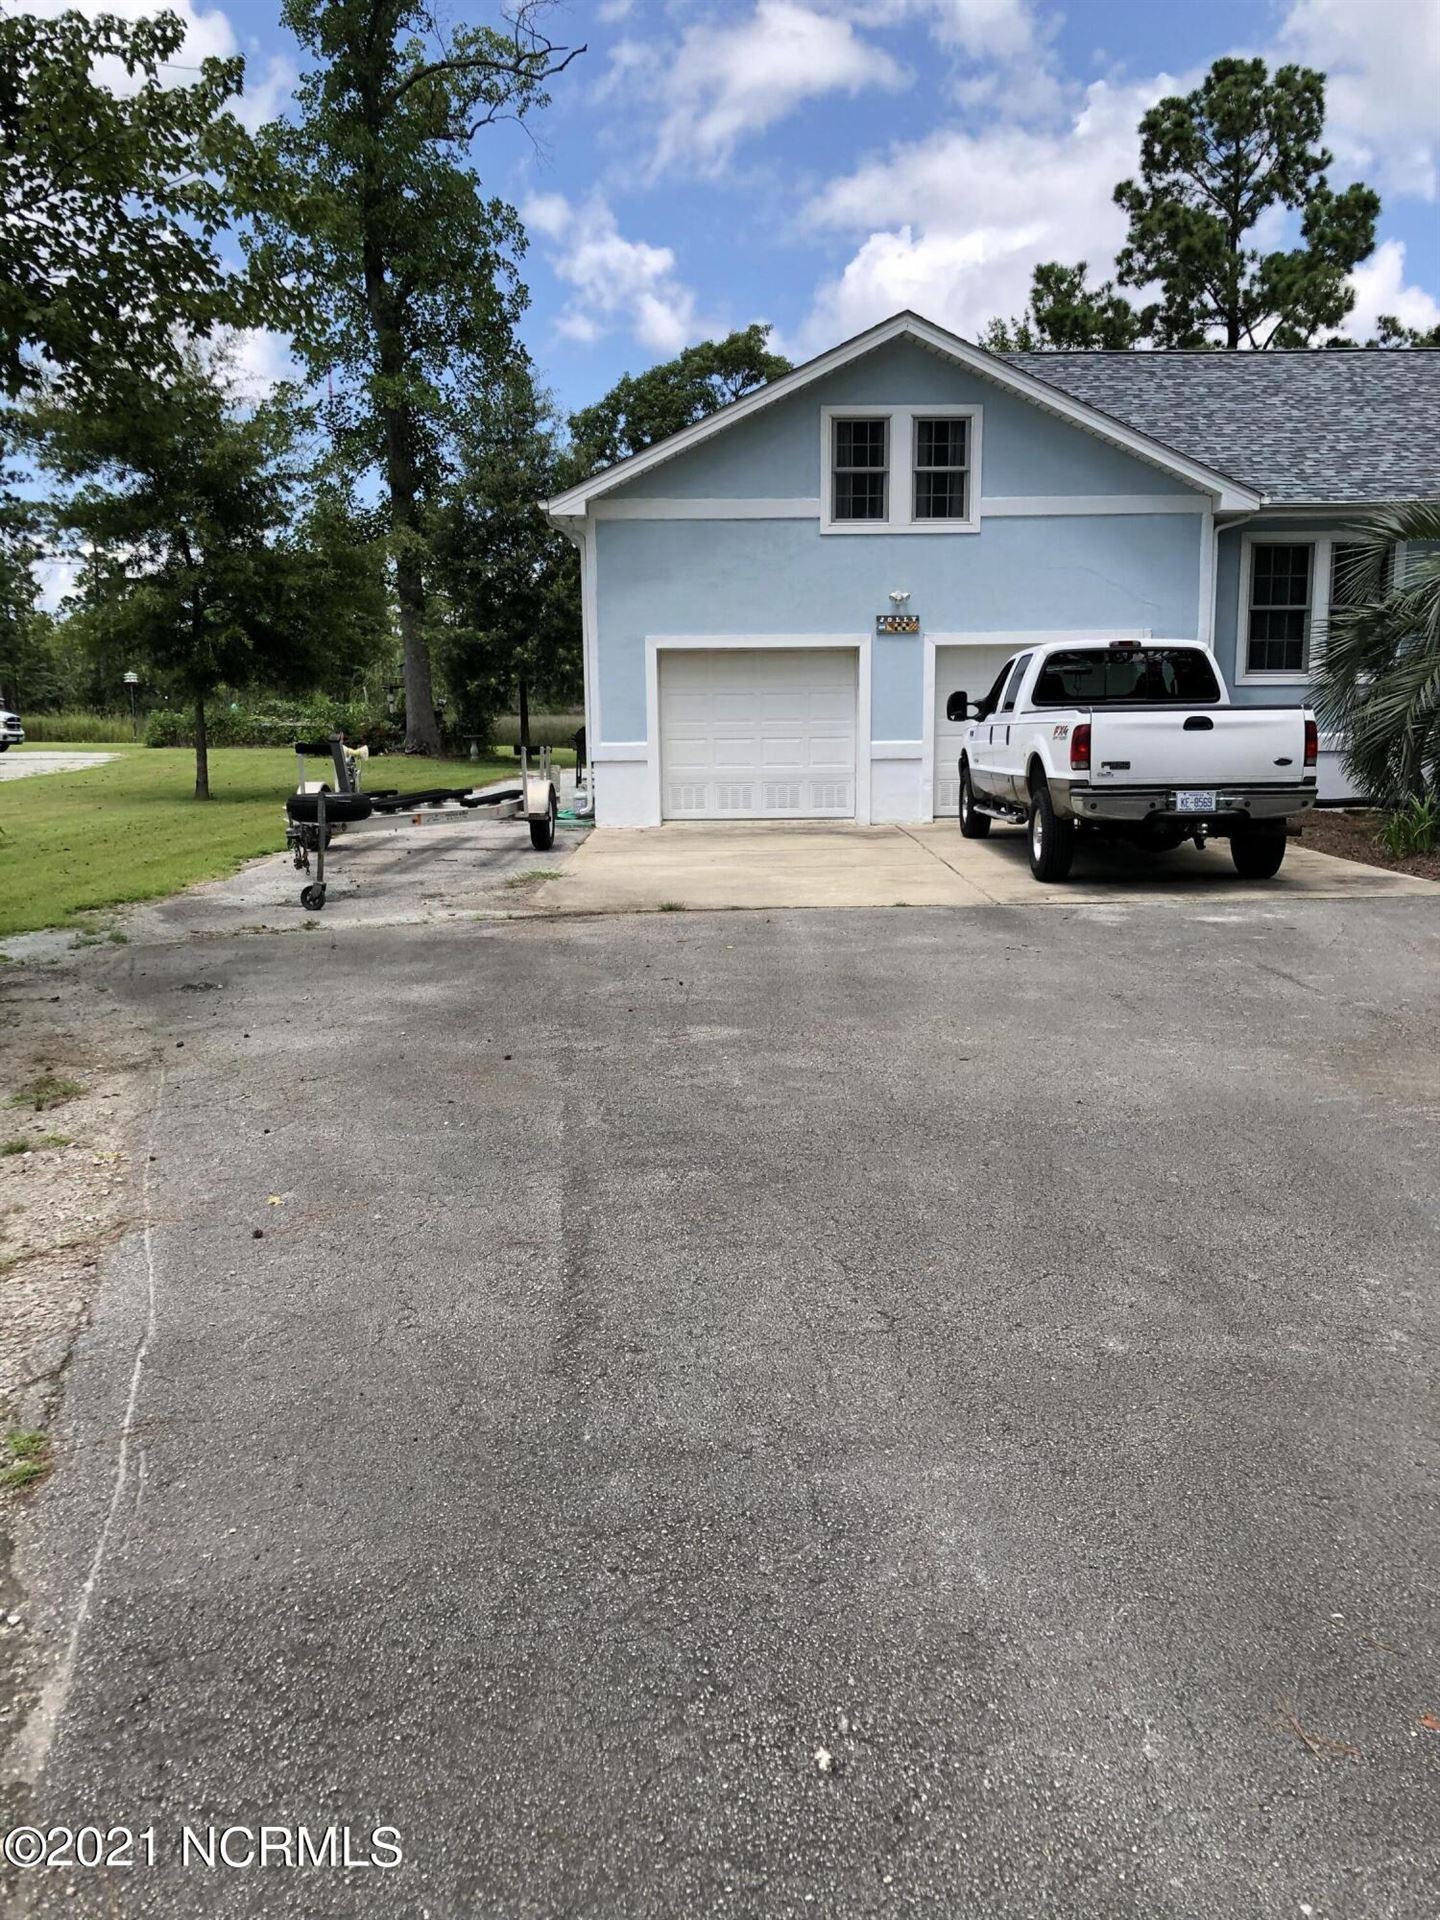 Photo of 216 Jonaquins Drive, Beaufort, NC 28516 (MLS # 100285690)